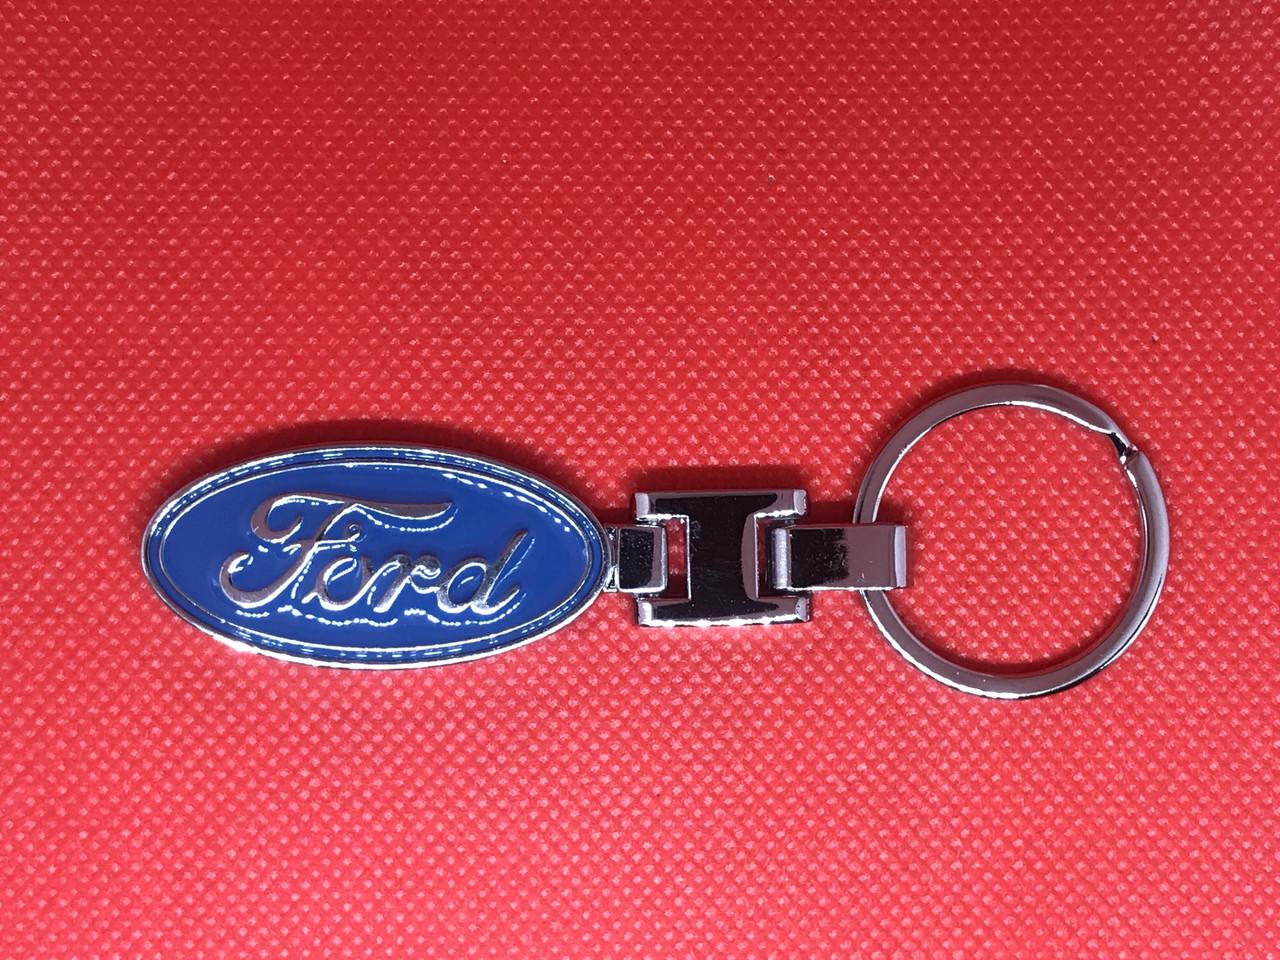 Брелок металлический для авто ключей Ford Форд